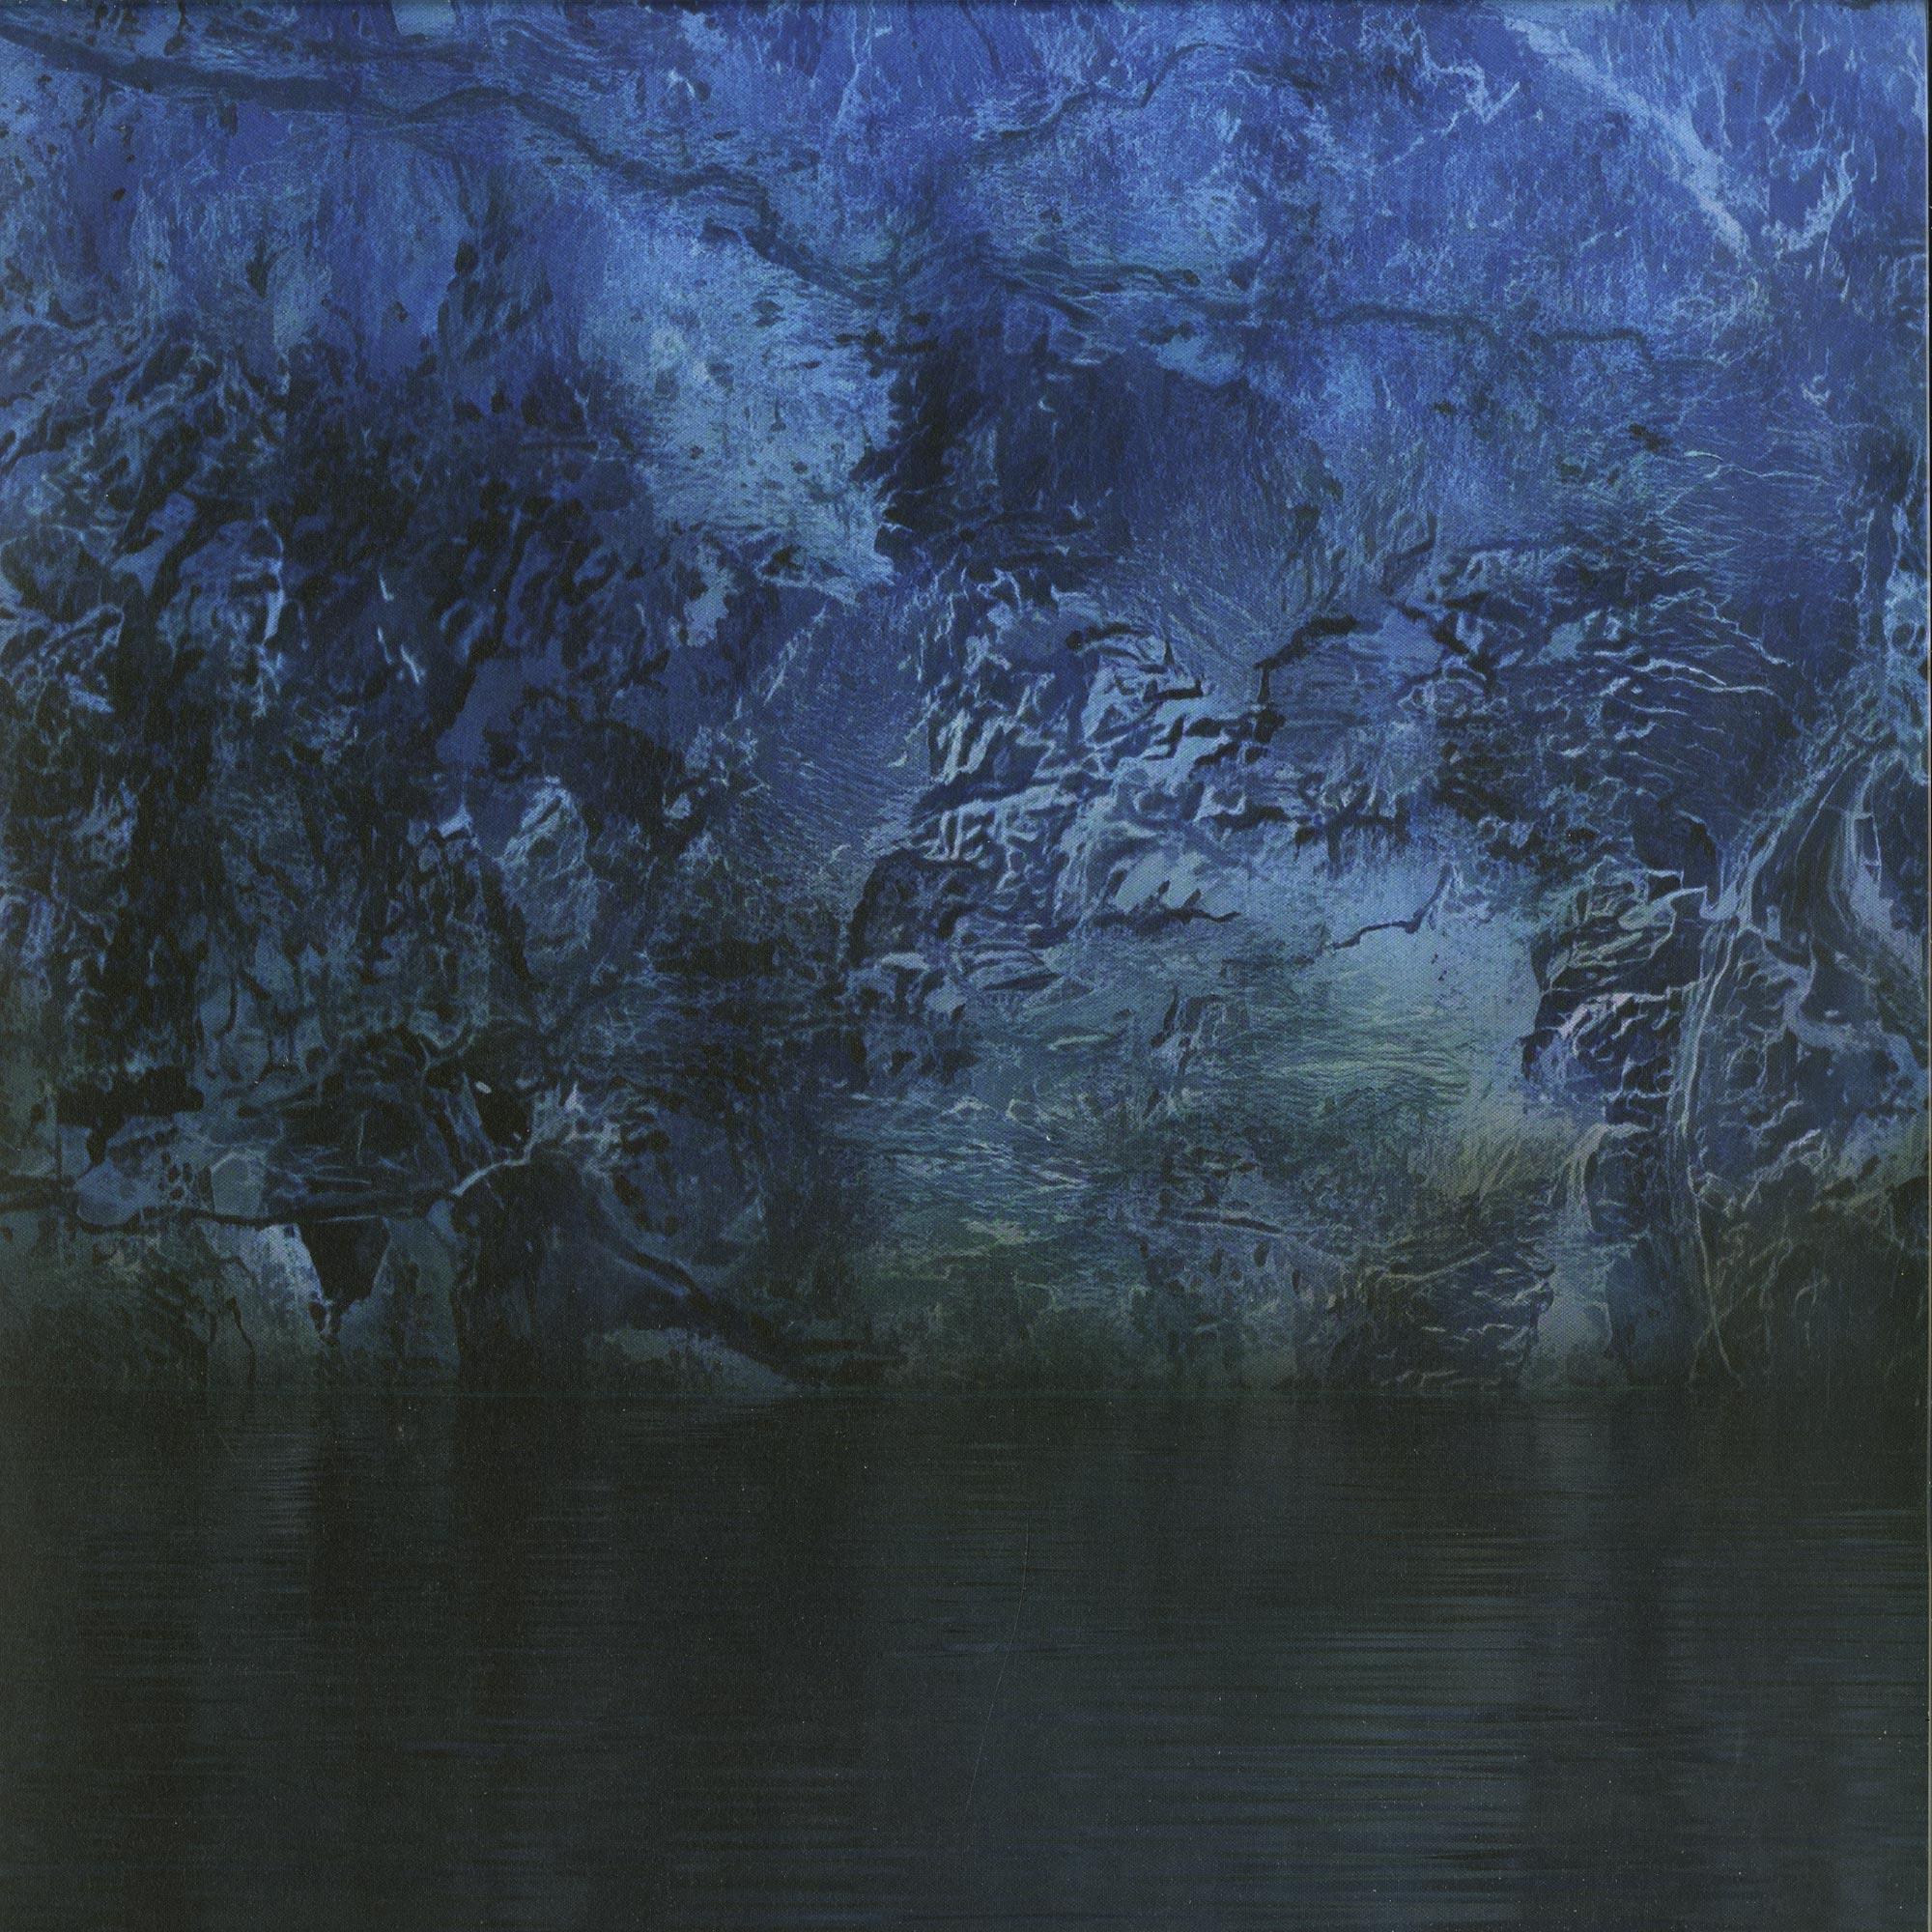 Blawan / SHDW & Obscure Shape / Jeroen Search / Stefan Vincent - CONTINUUM 2: MAGNO HYACINTHUM